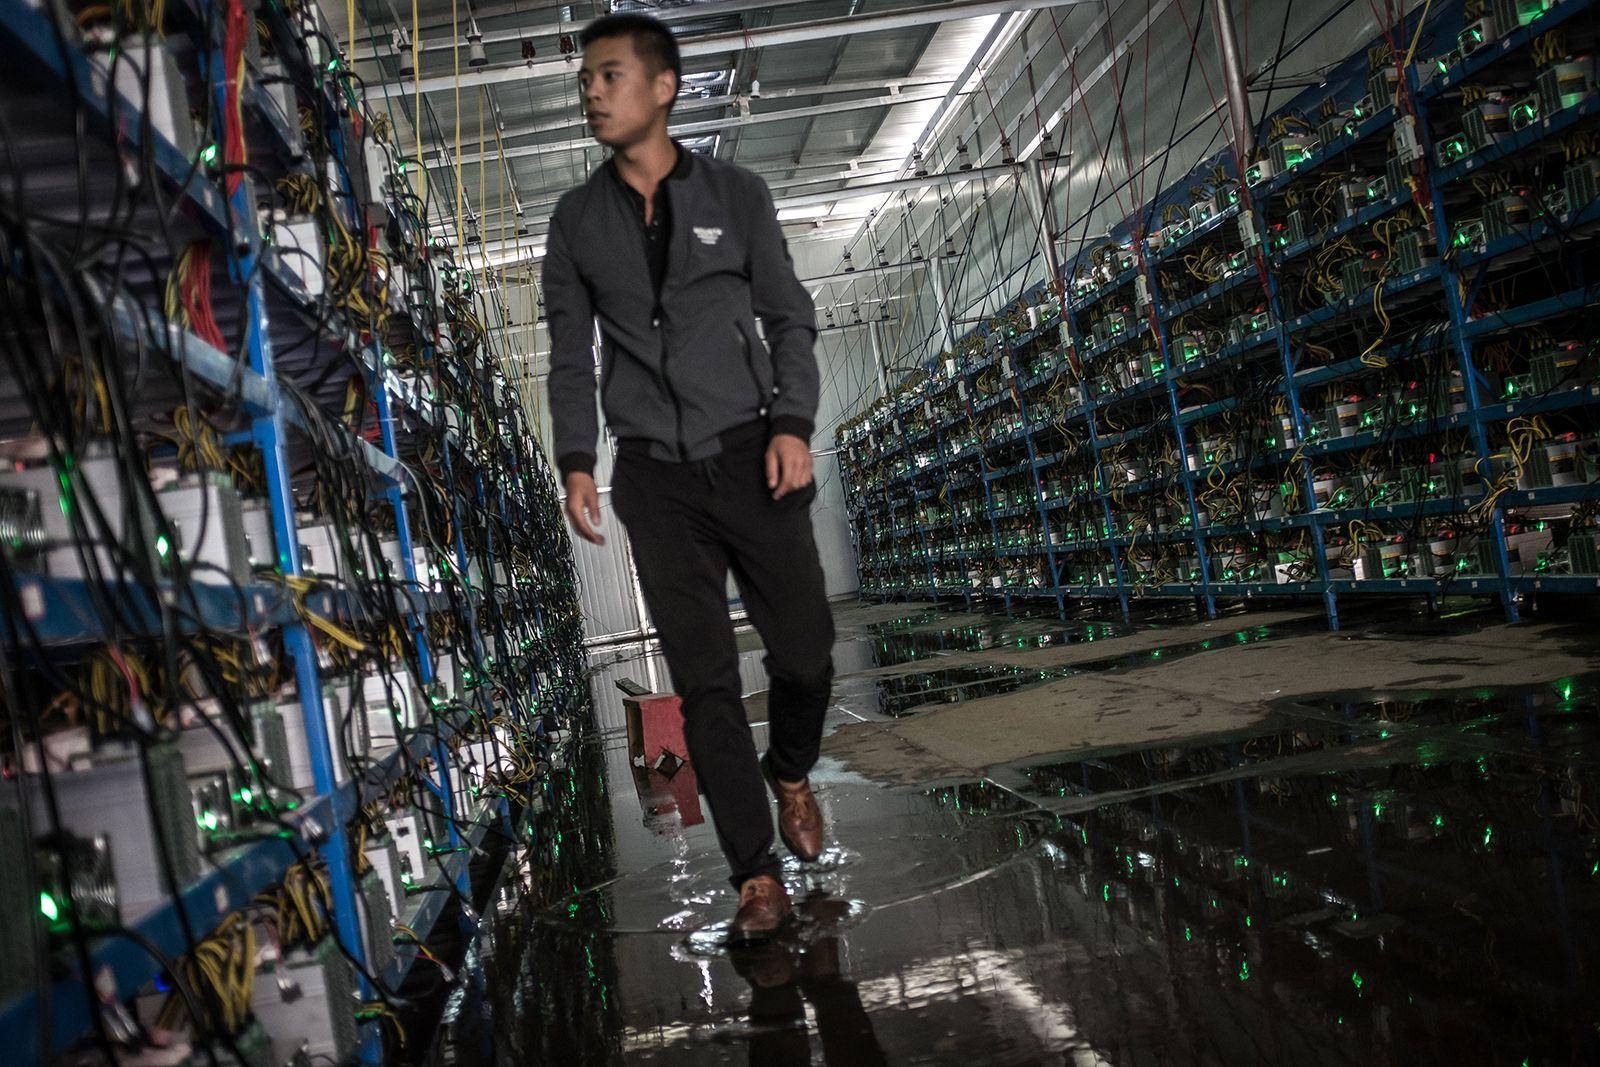 Майнинг биткоинов в китайских масштабах